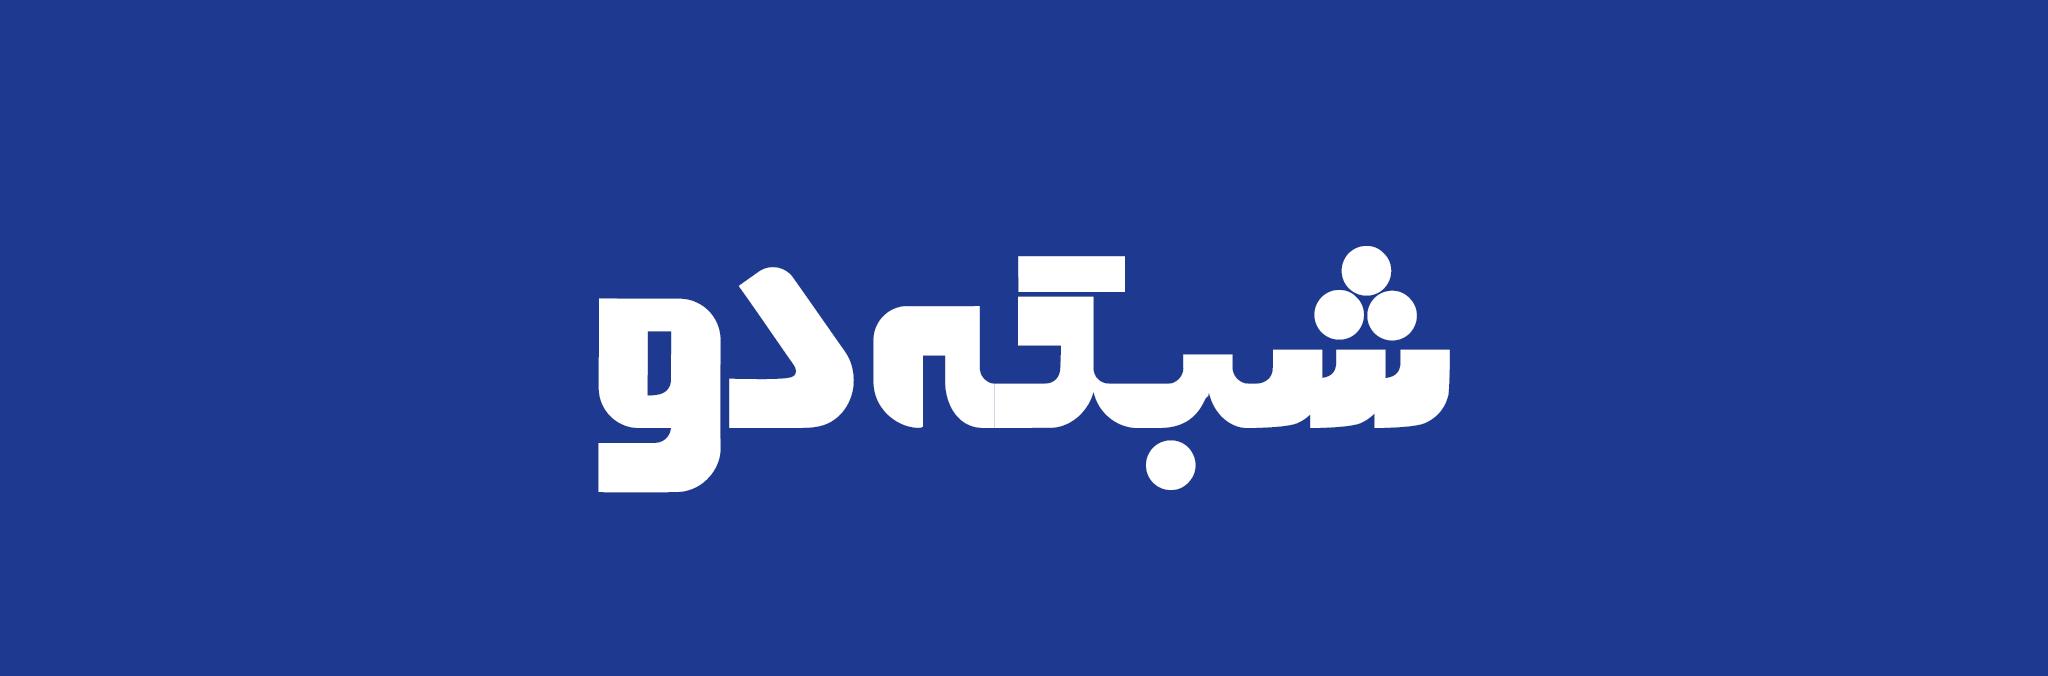 دانلود فونت لوگوی بانک تجارت